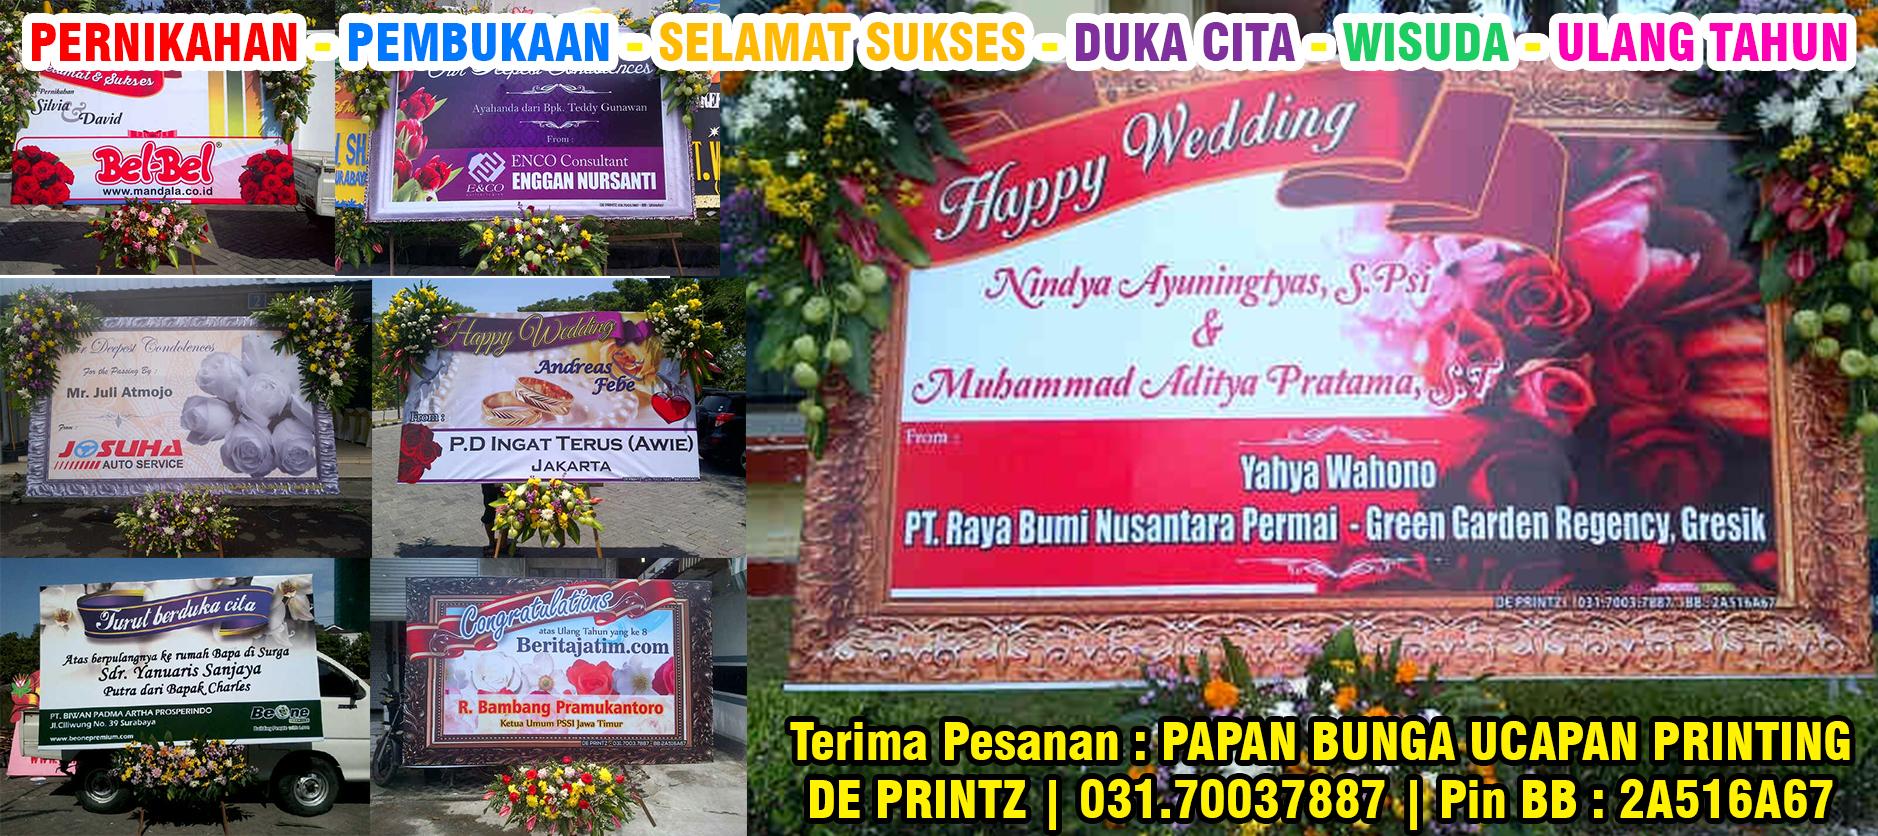 Pesan Papan Bunga Ucapan Digital Printing Murah Surabaya